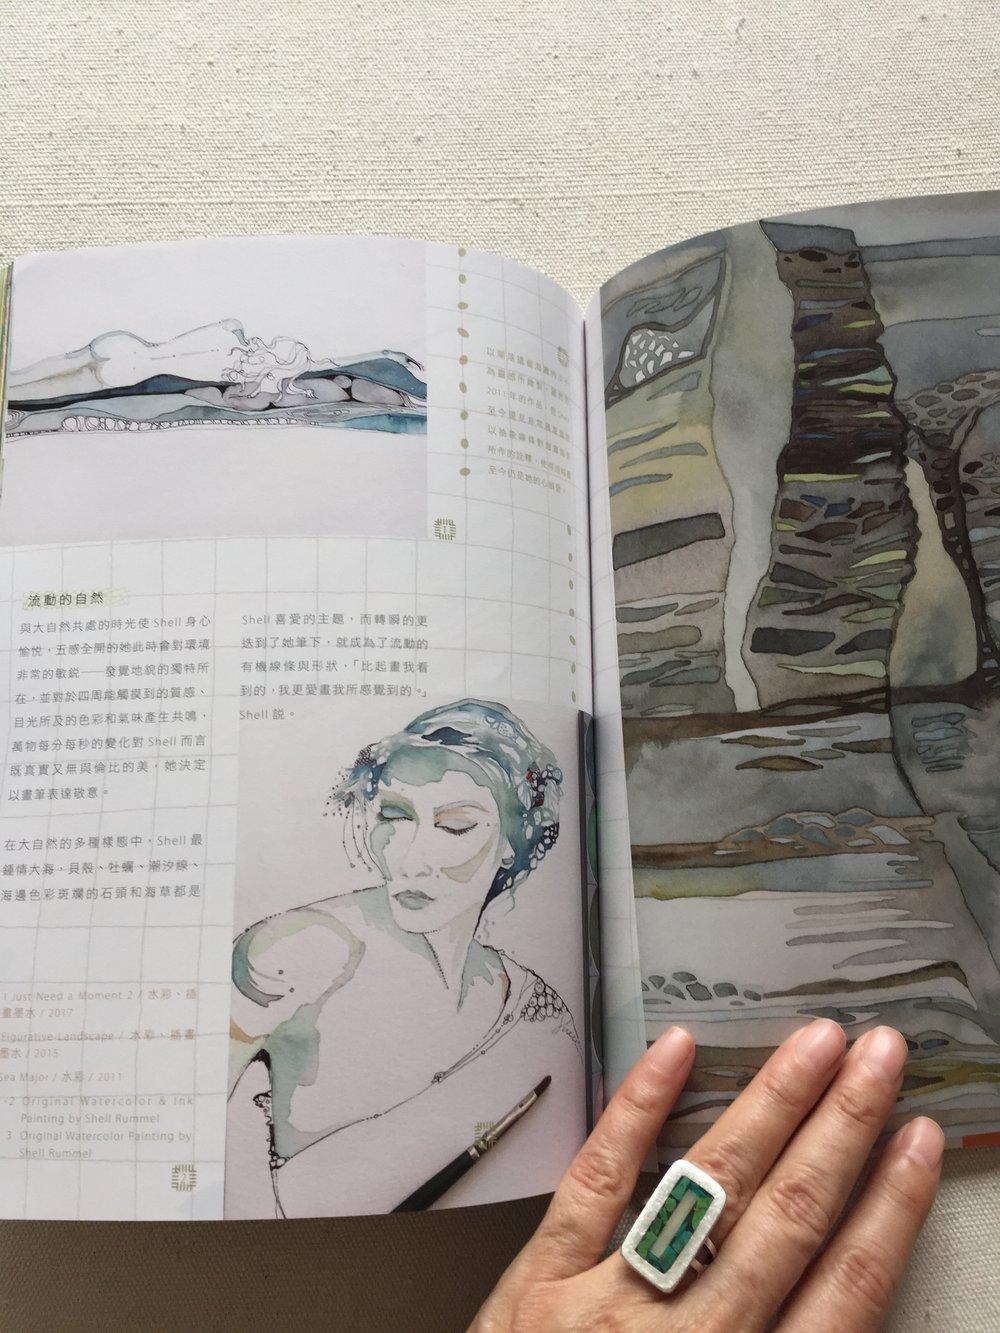 Shell Rummel DPI magazine taiwan